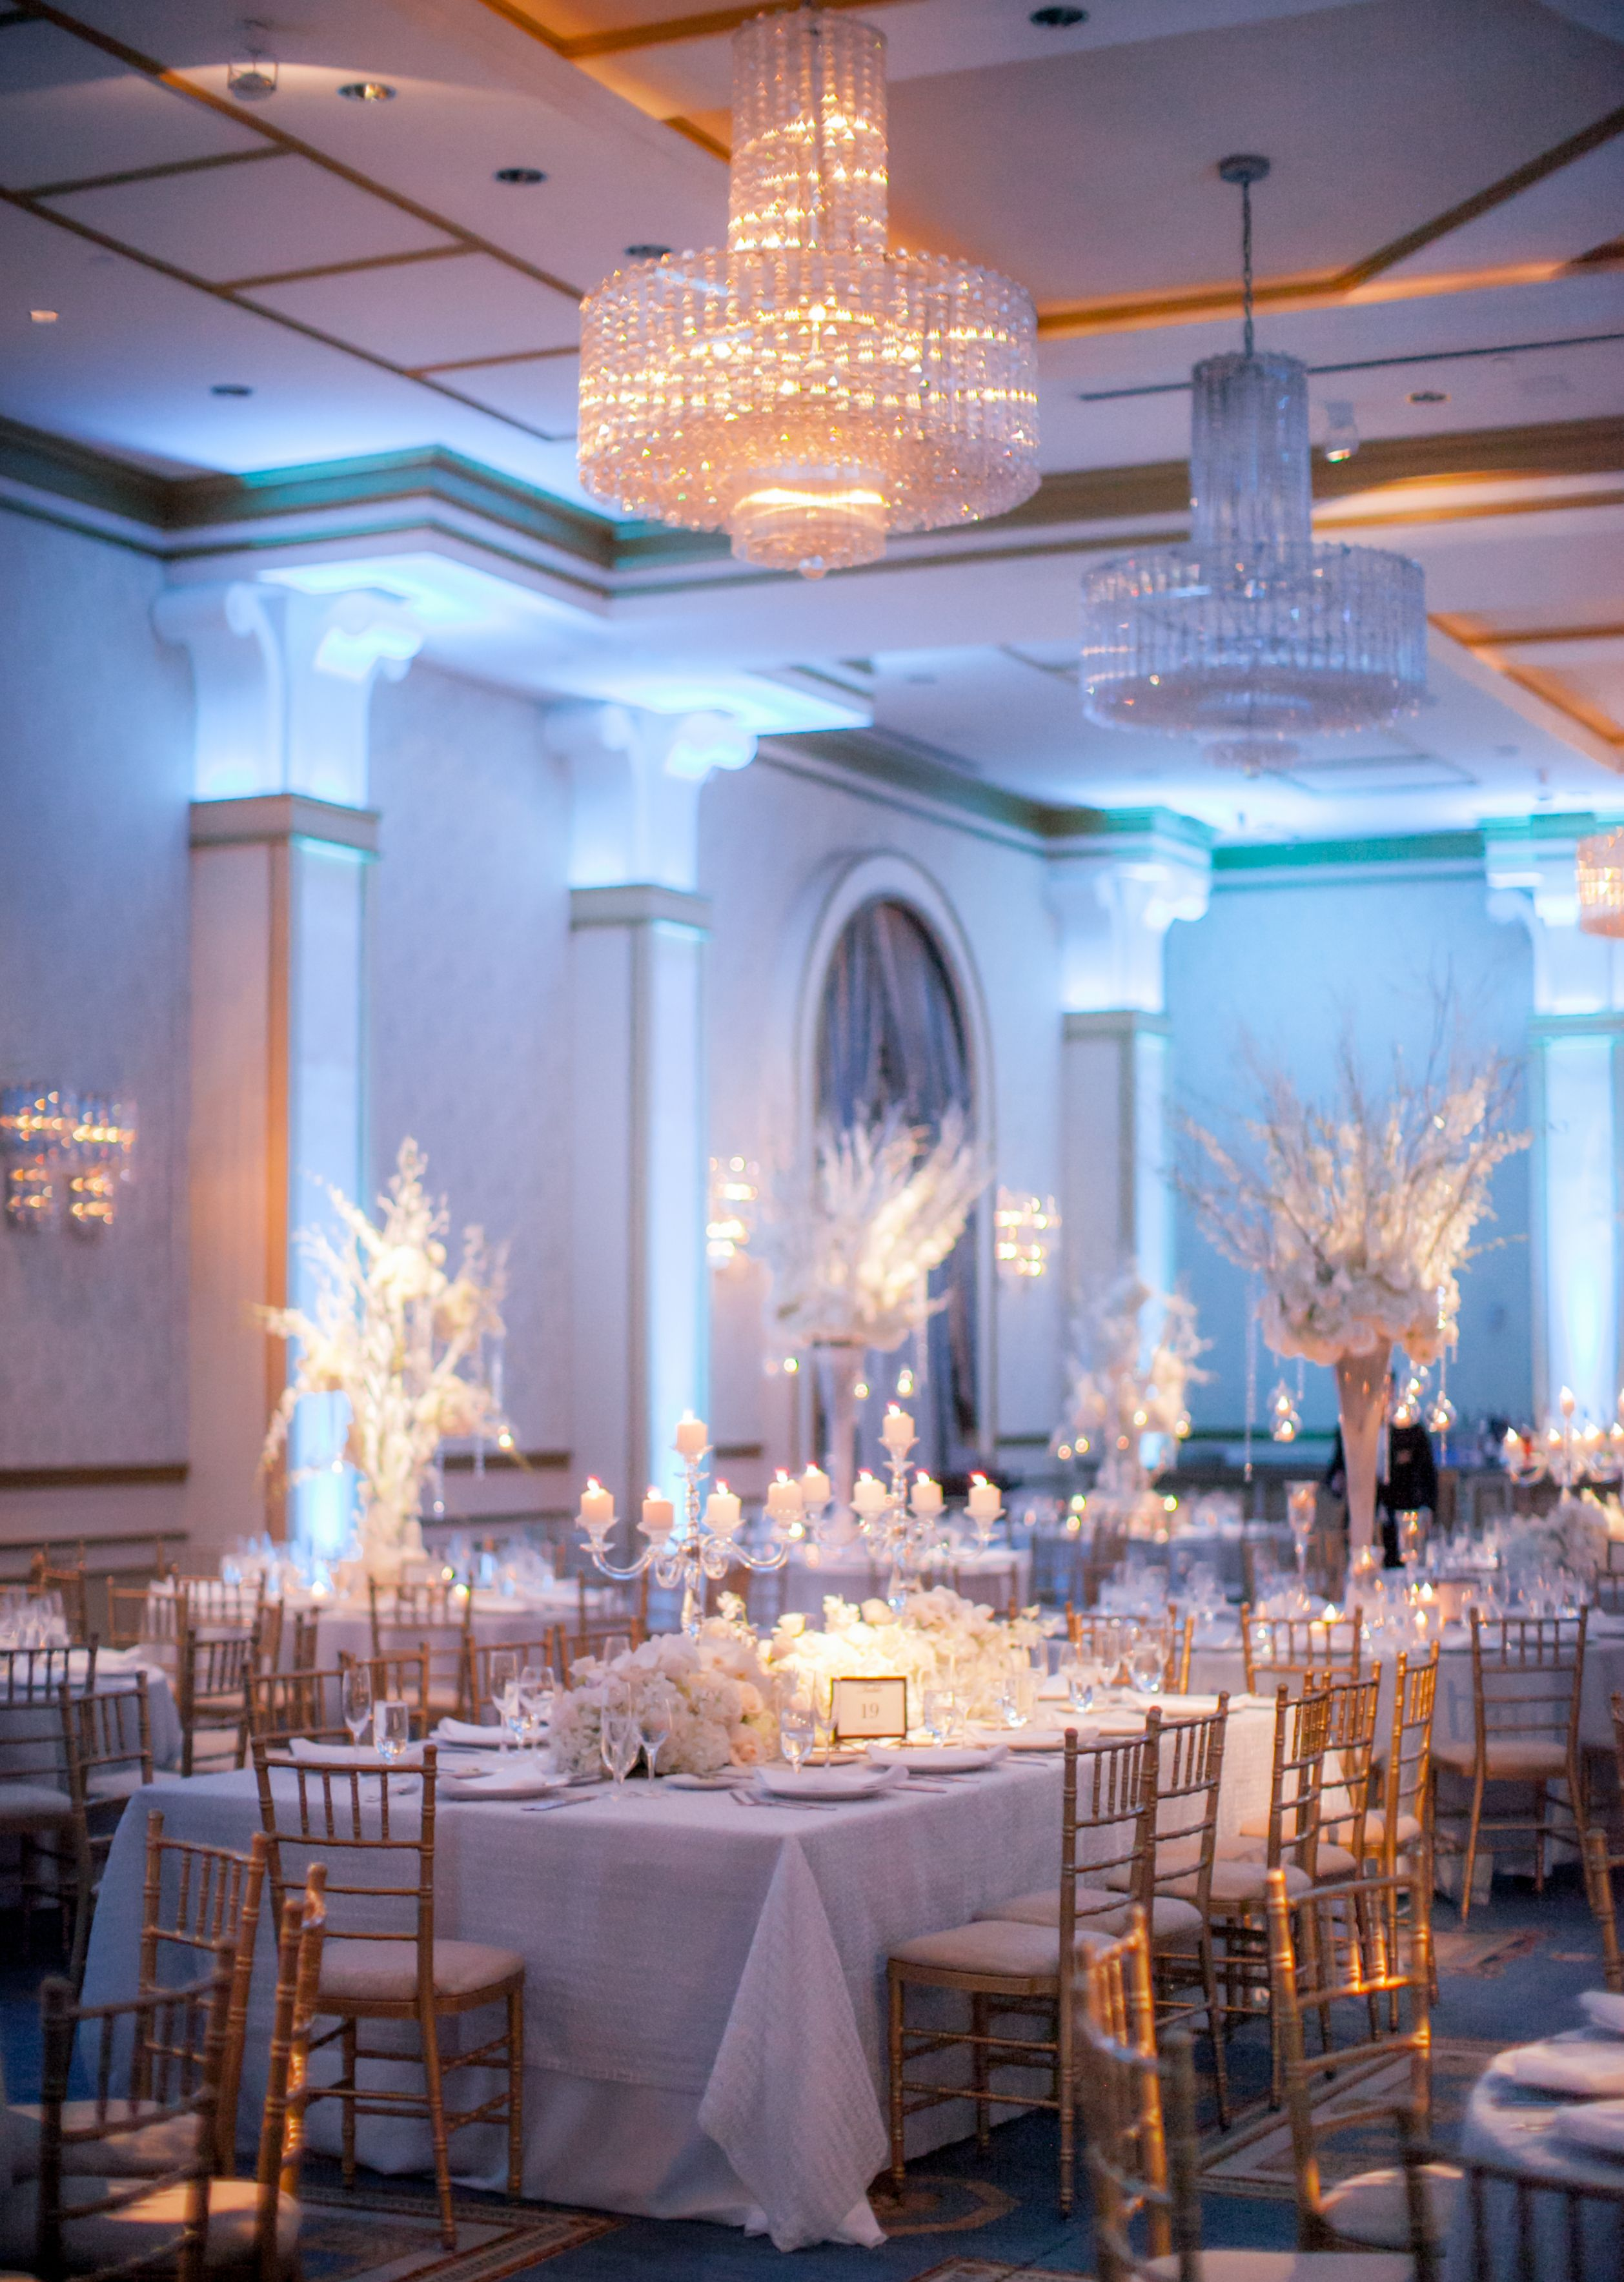 Clane Gessel Photography- Wedding Decor- Wedding Decor Inspiration- #Decor #Style